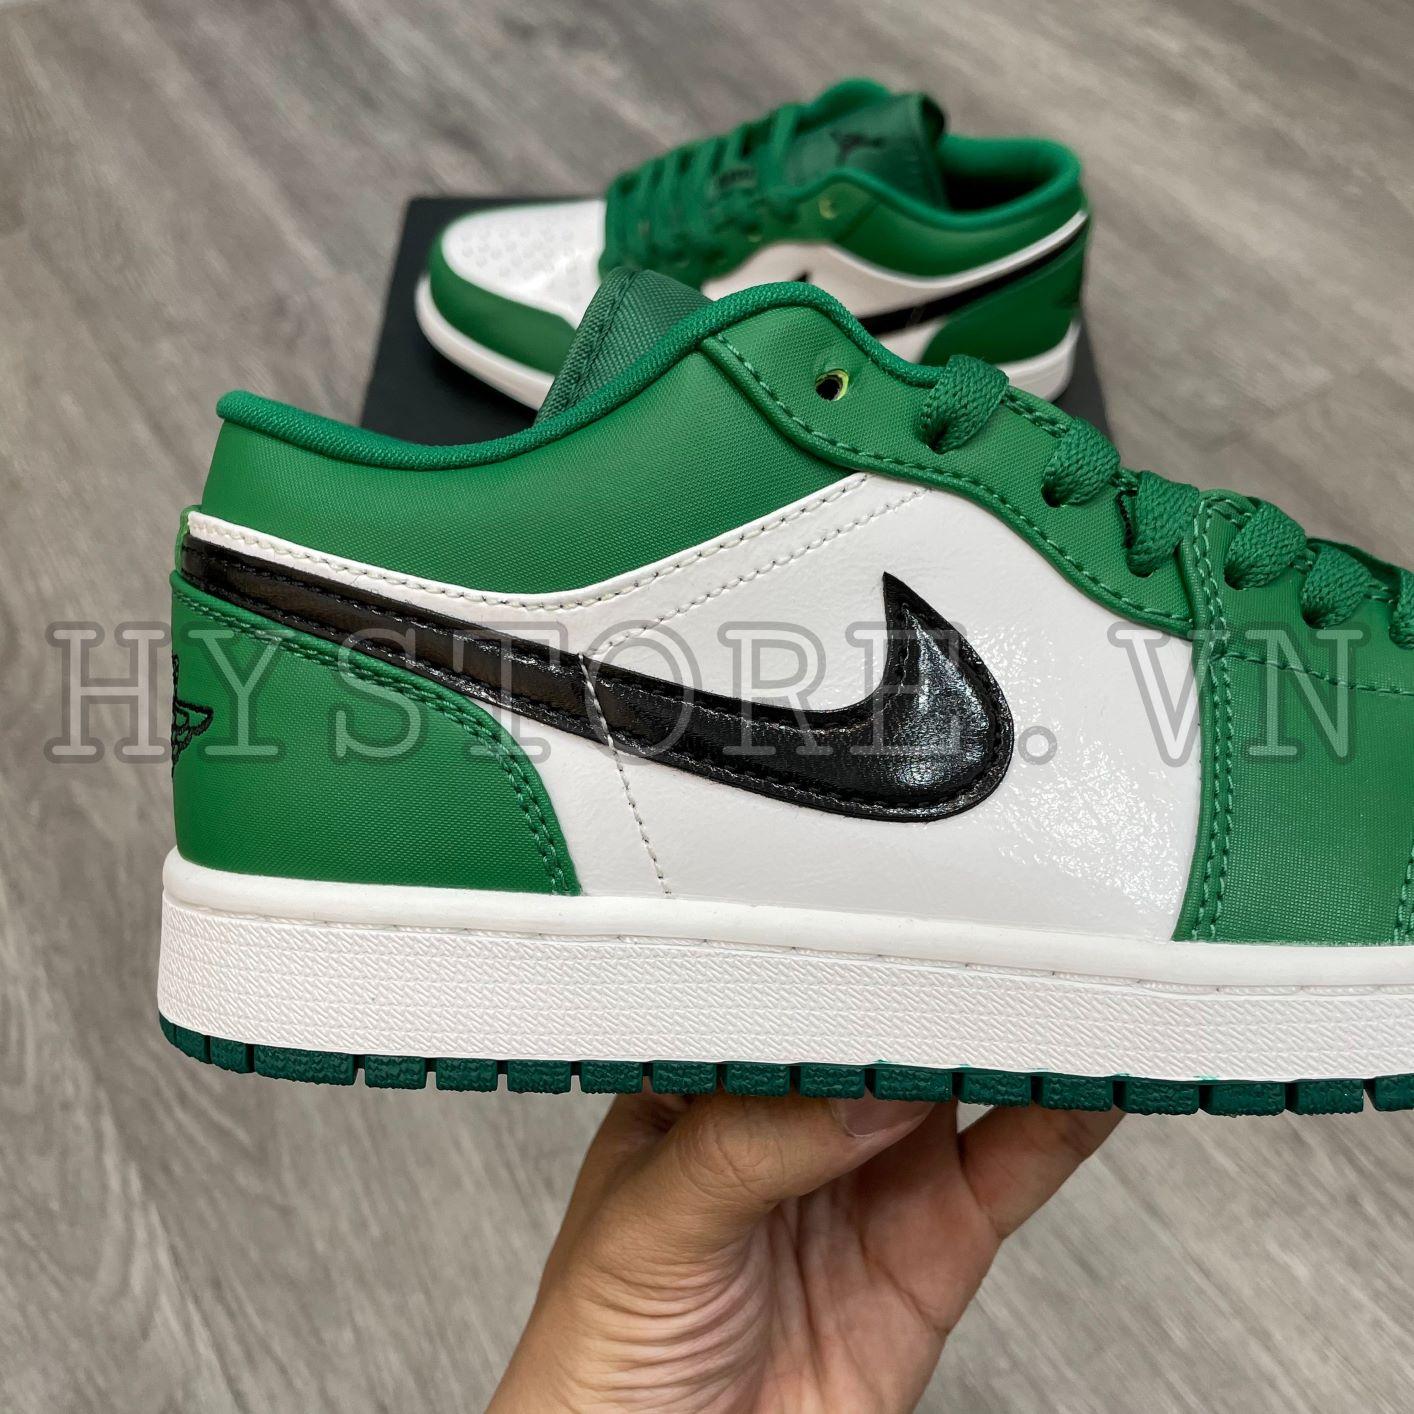 Giày Nike Jordan1 low pine green